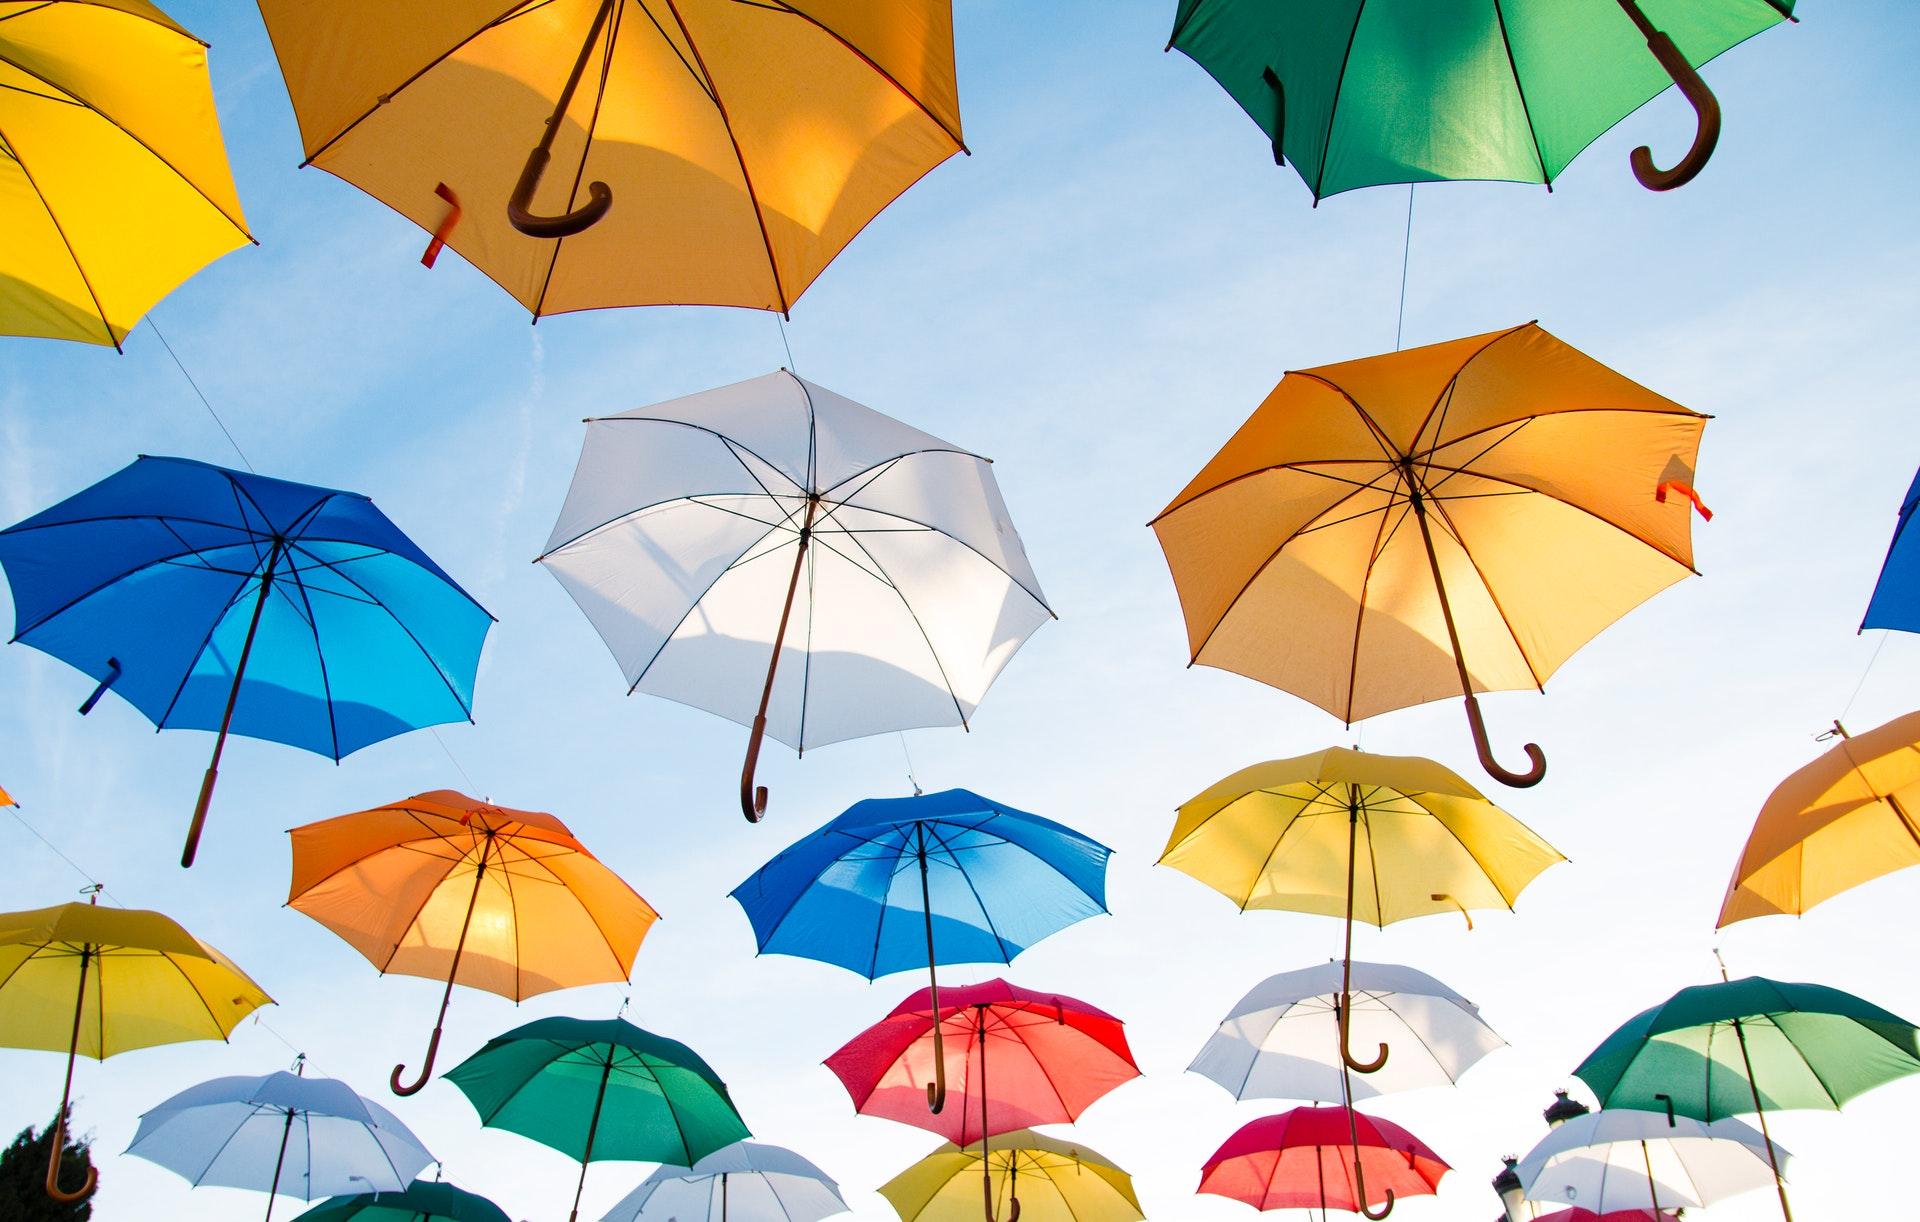 lots of pretty umbrellas in the sky